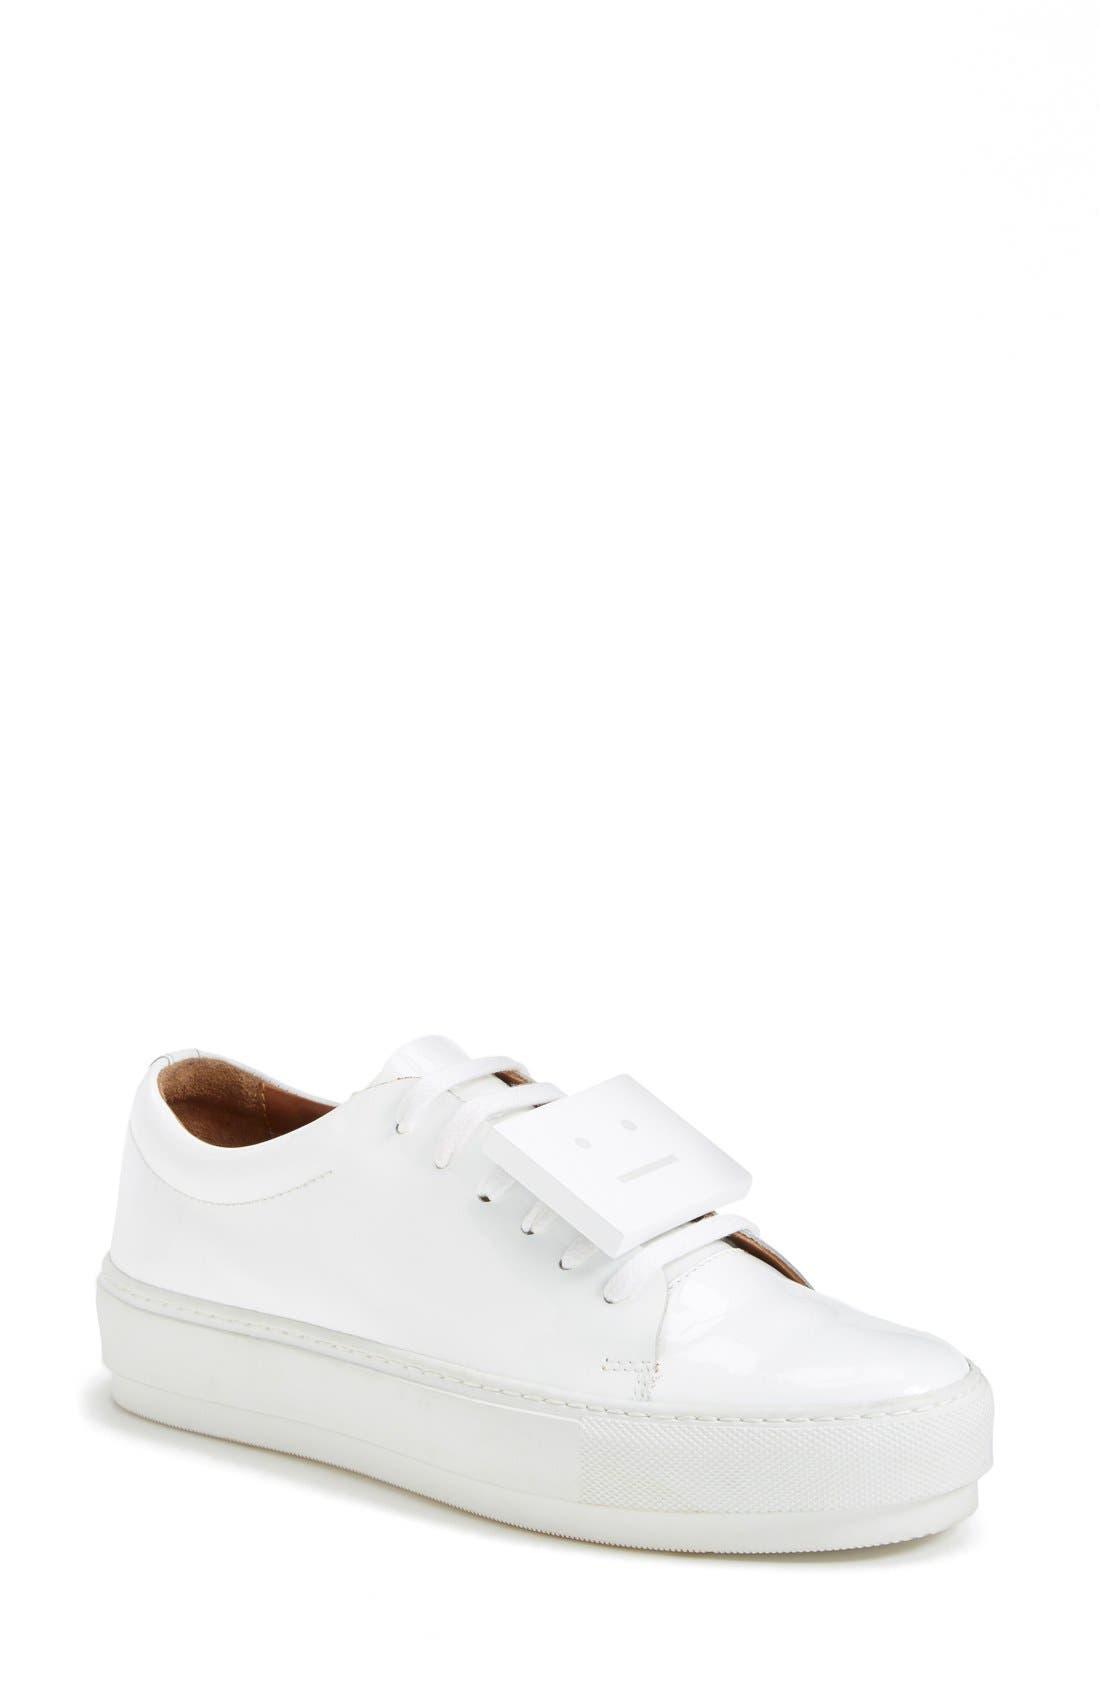 ACNE Studios 'Adriana' Leather Sneaker (Women)